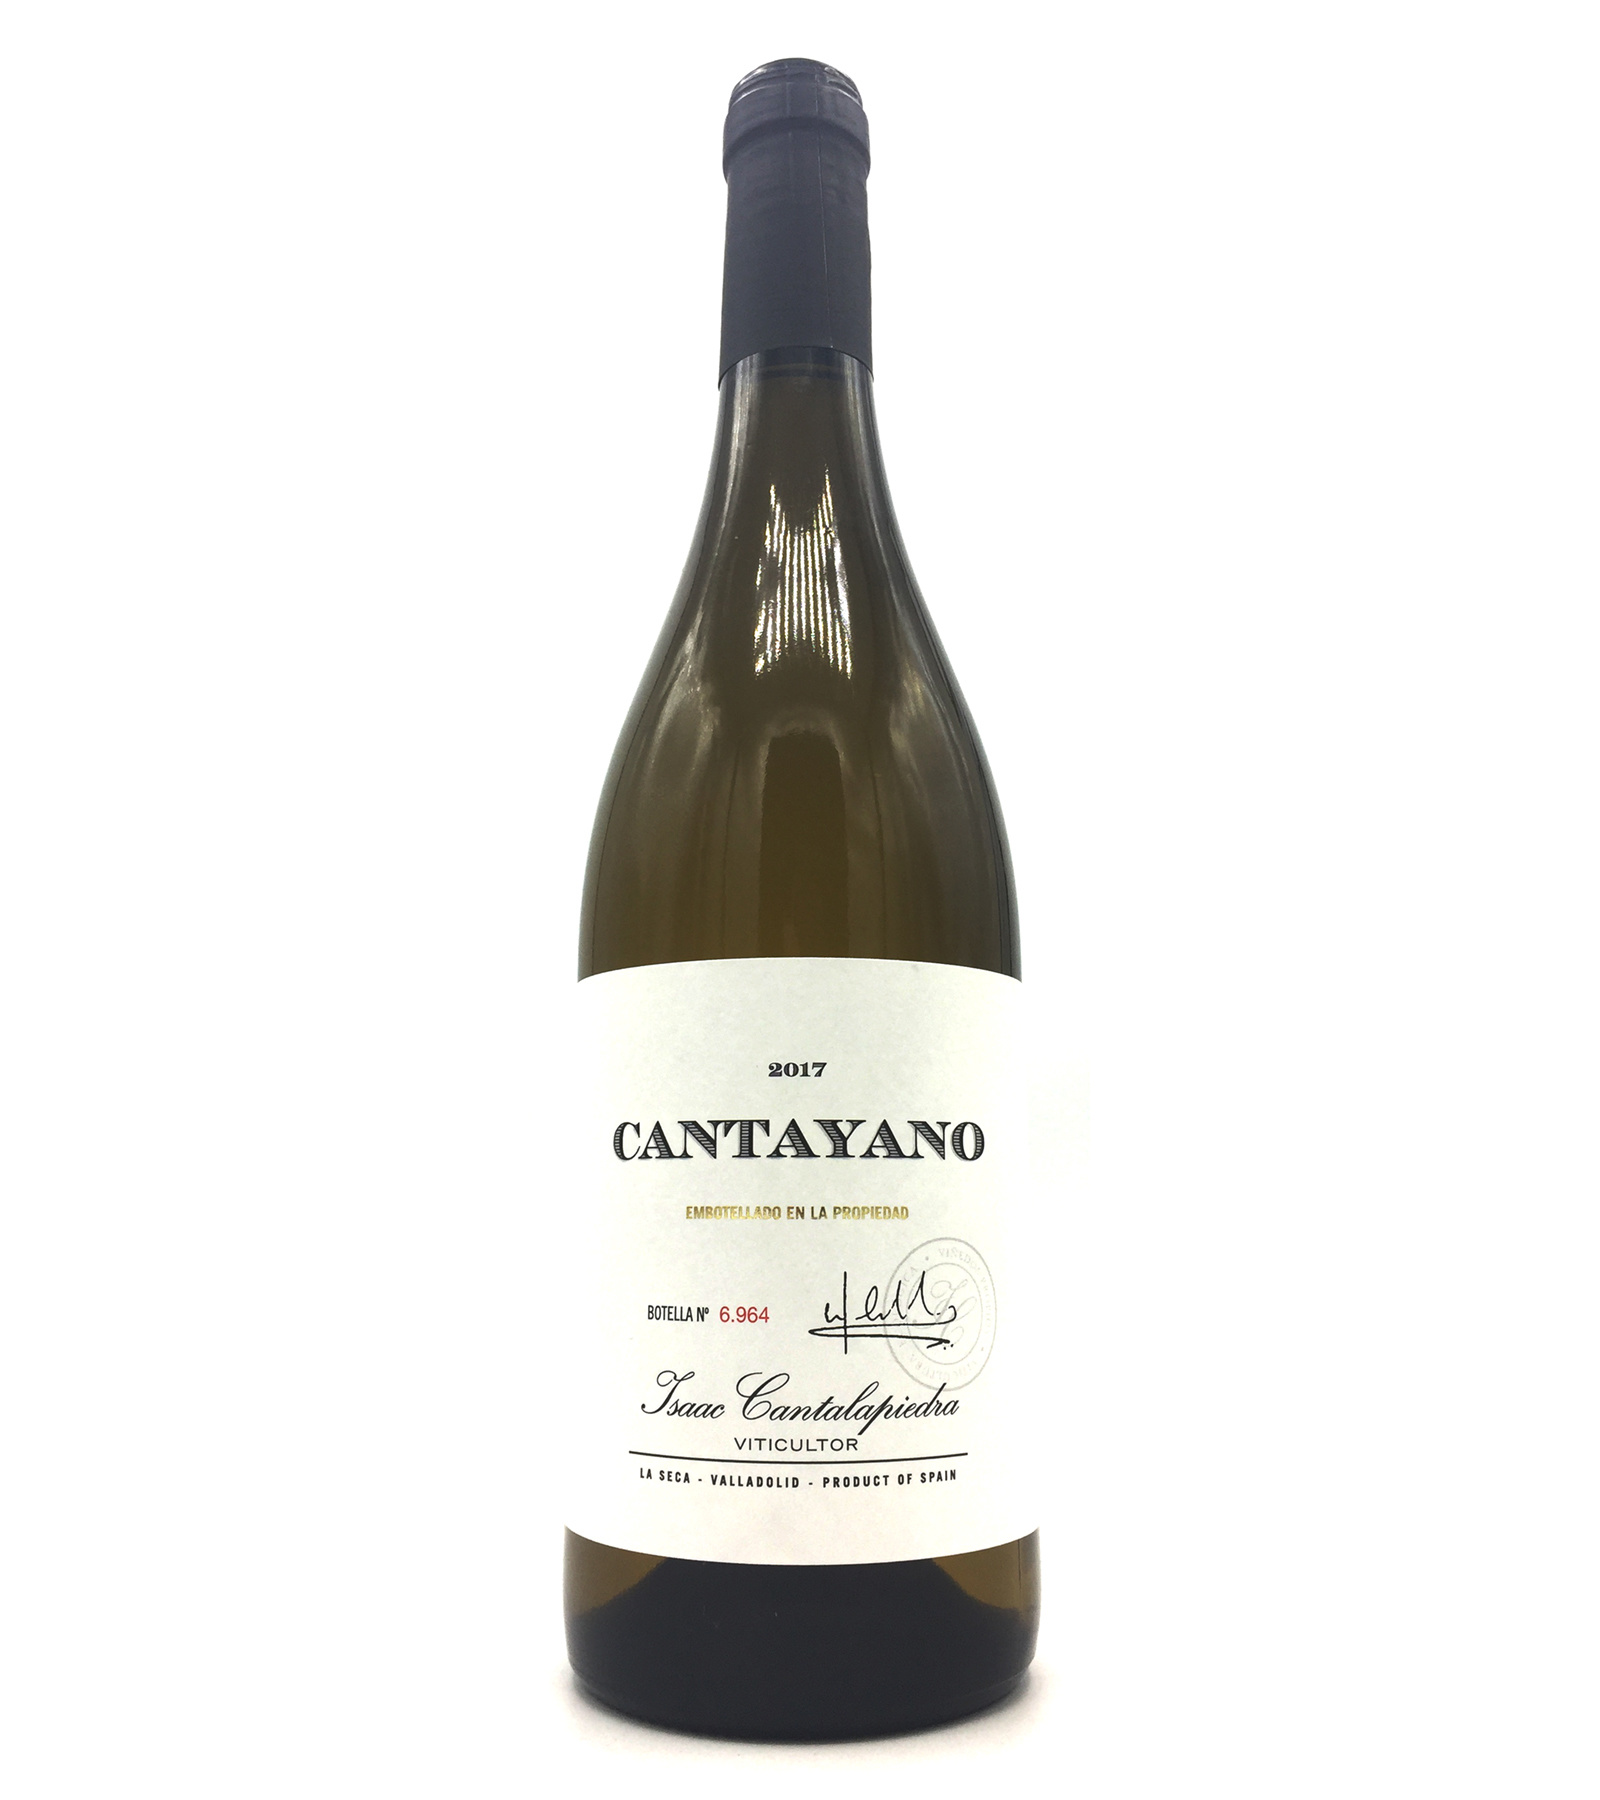 Cantayano 2017 Viticultores Cantalapiedra